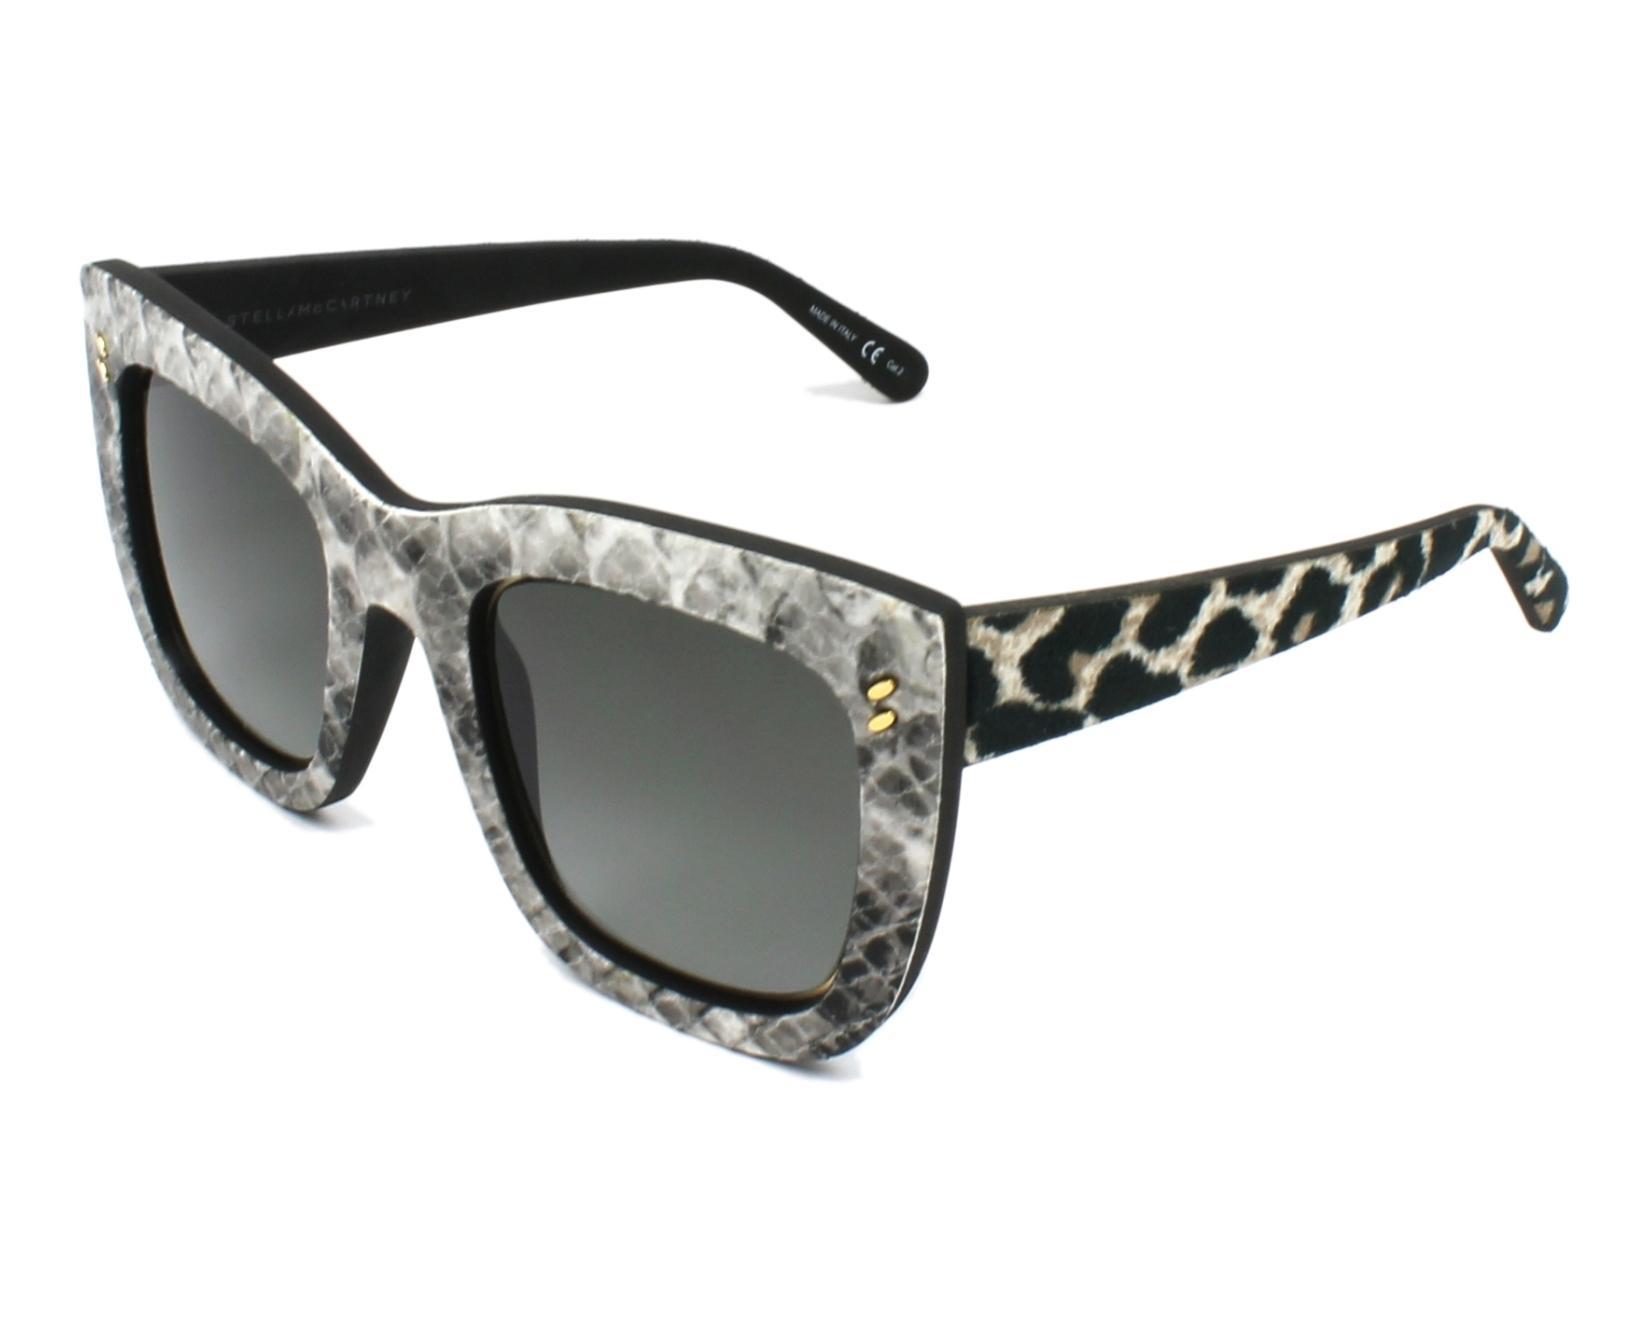 06adb74de2 Stella Mccartney Sunglasses Leo With Grey Lenses Sc 0067 S